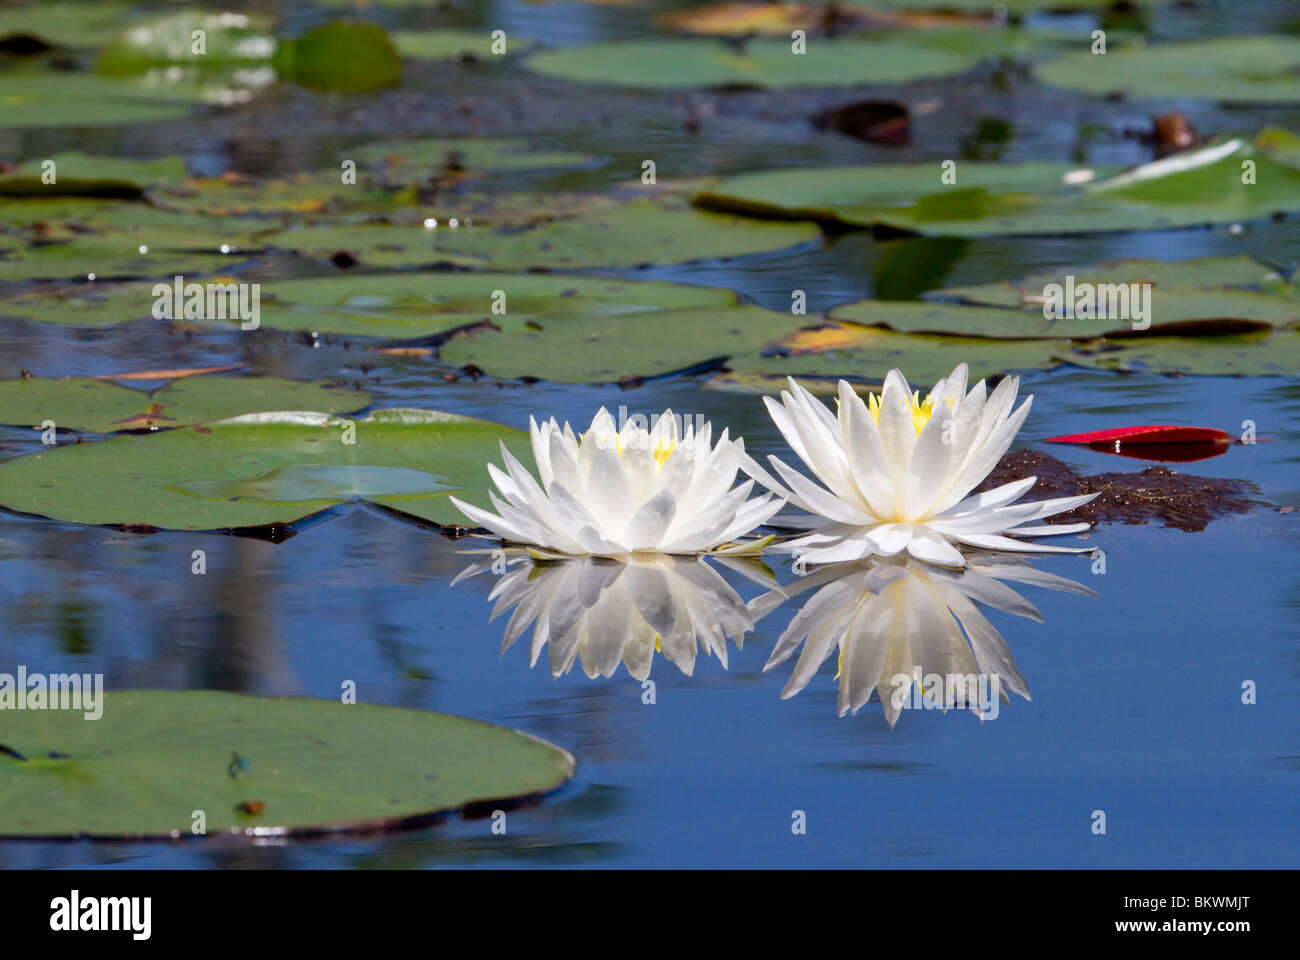 Wild Water lilly (Nymphaea odorata). Imagen De Stock